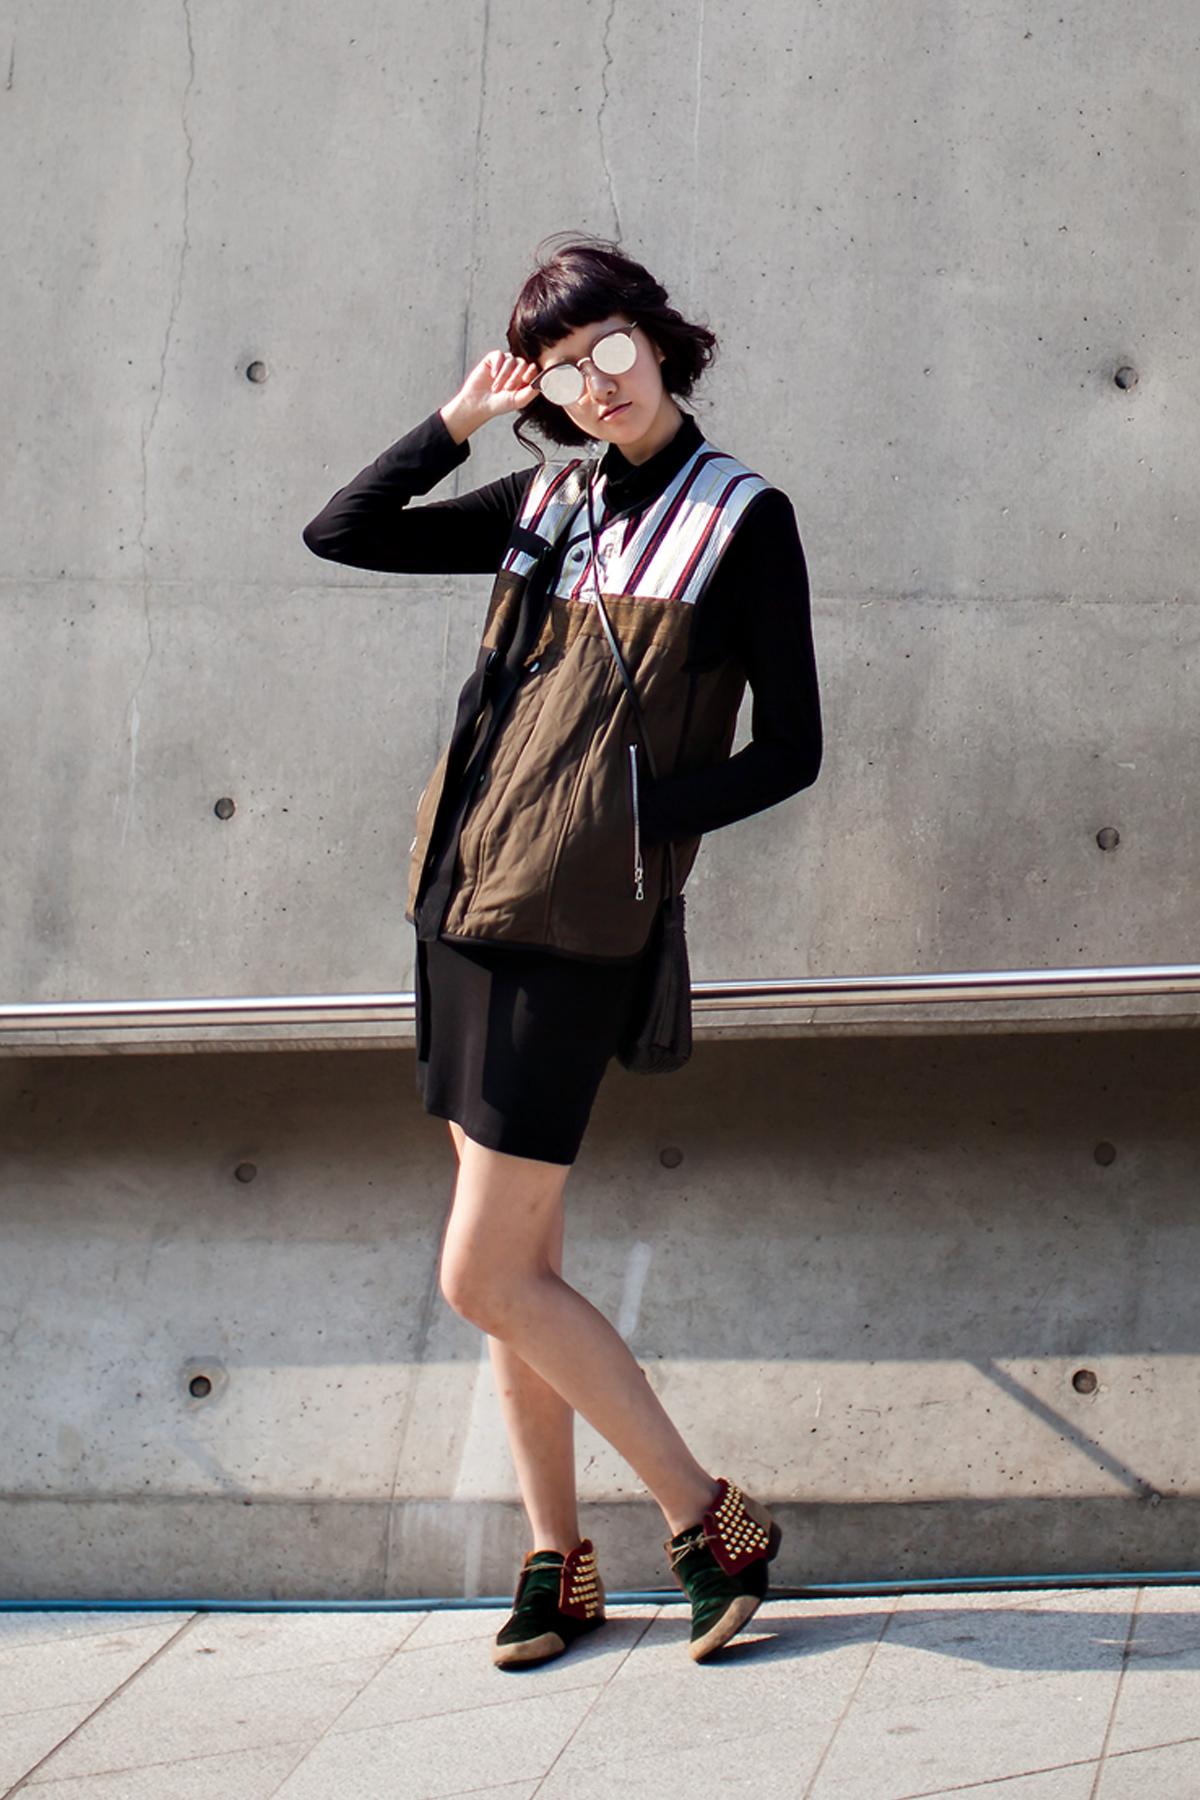 On the street… Shin Haenam Seoul fashion week 2016 SS